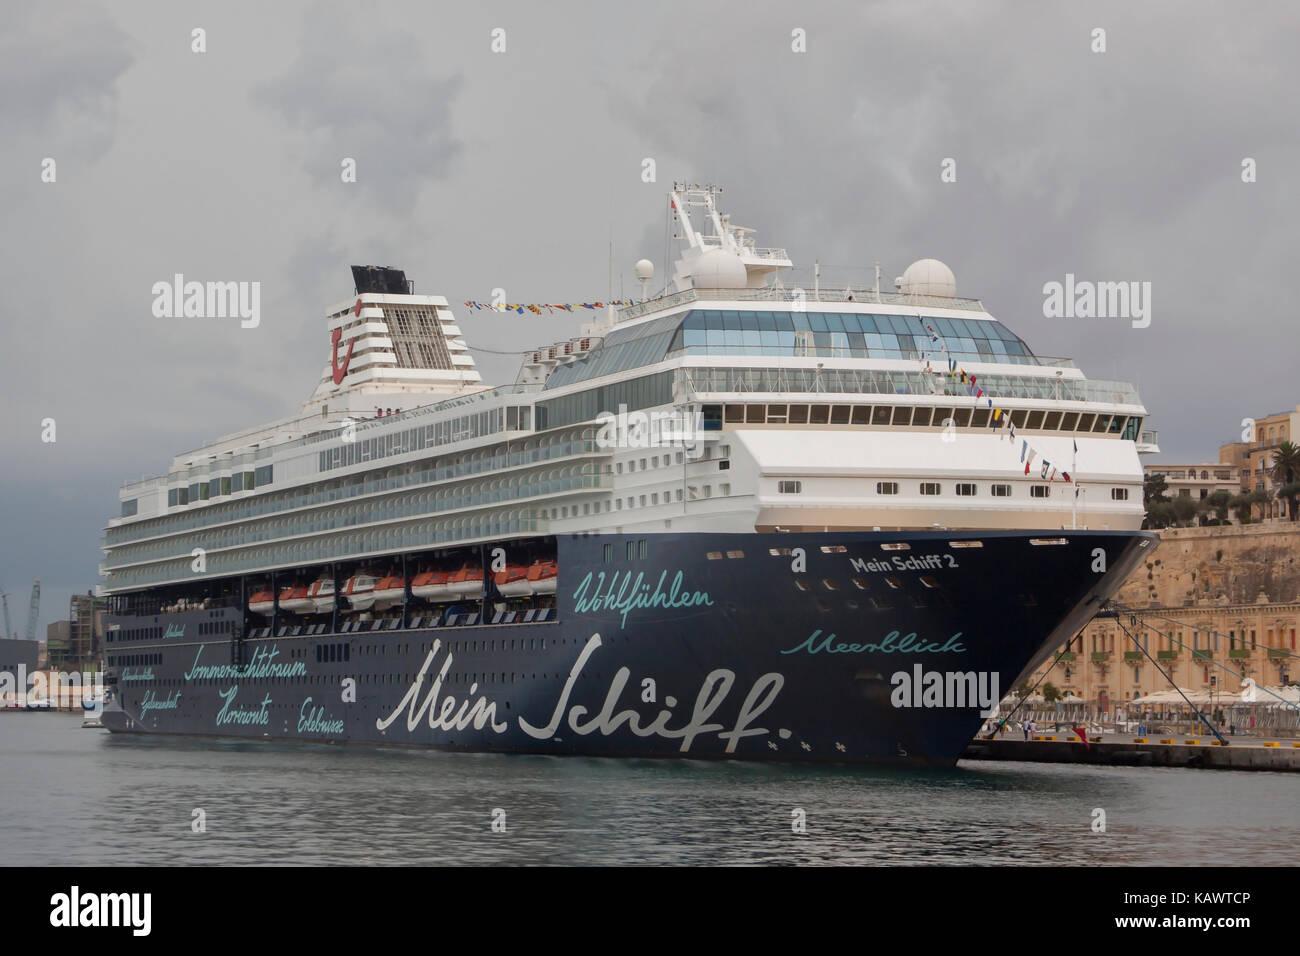 Passenger Century Class Cruise Ship Mein Schiff 2 of TUI Cruises moored in Grand Harbour Valetta Malta - Stock Image